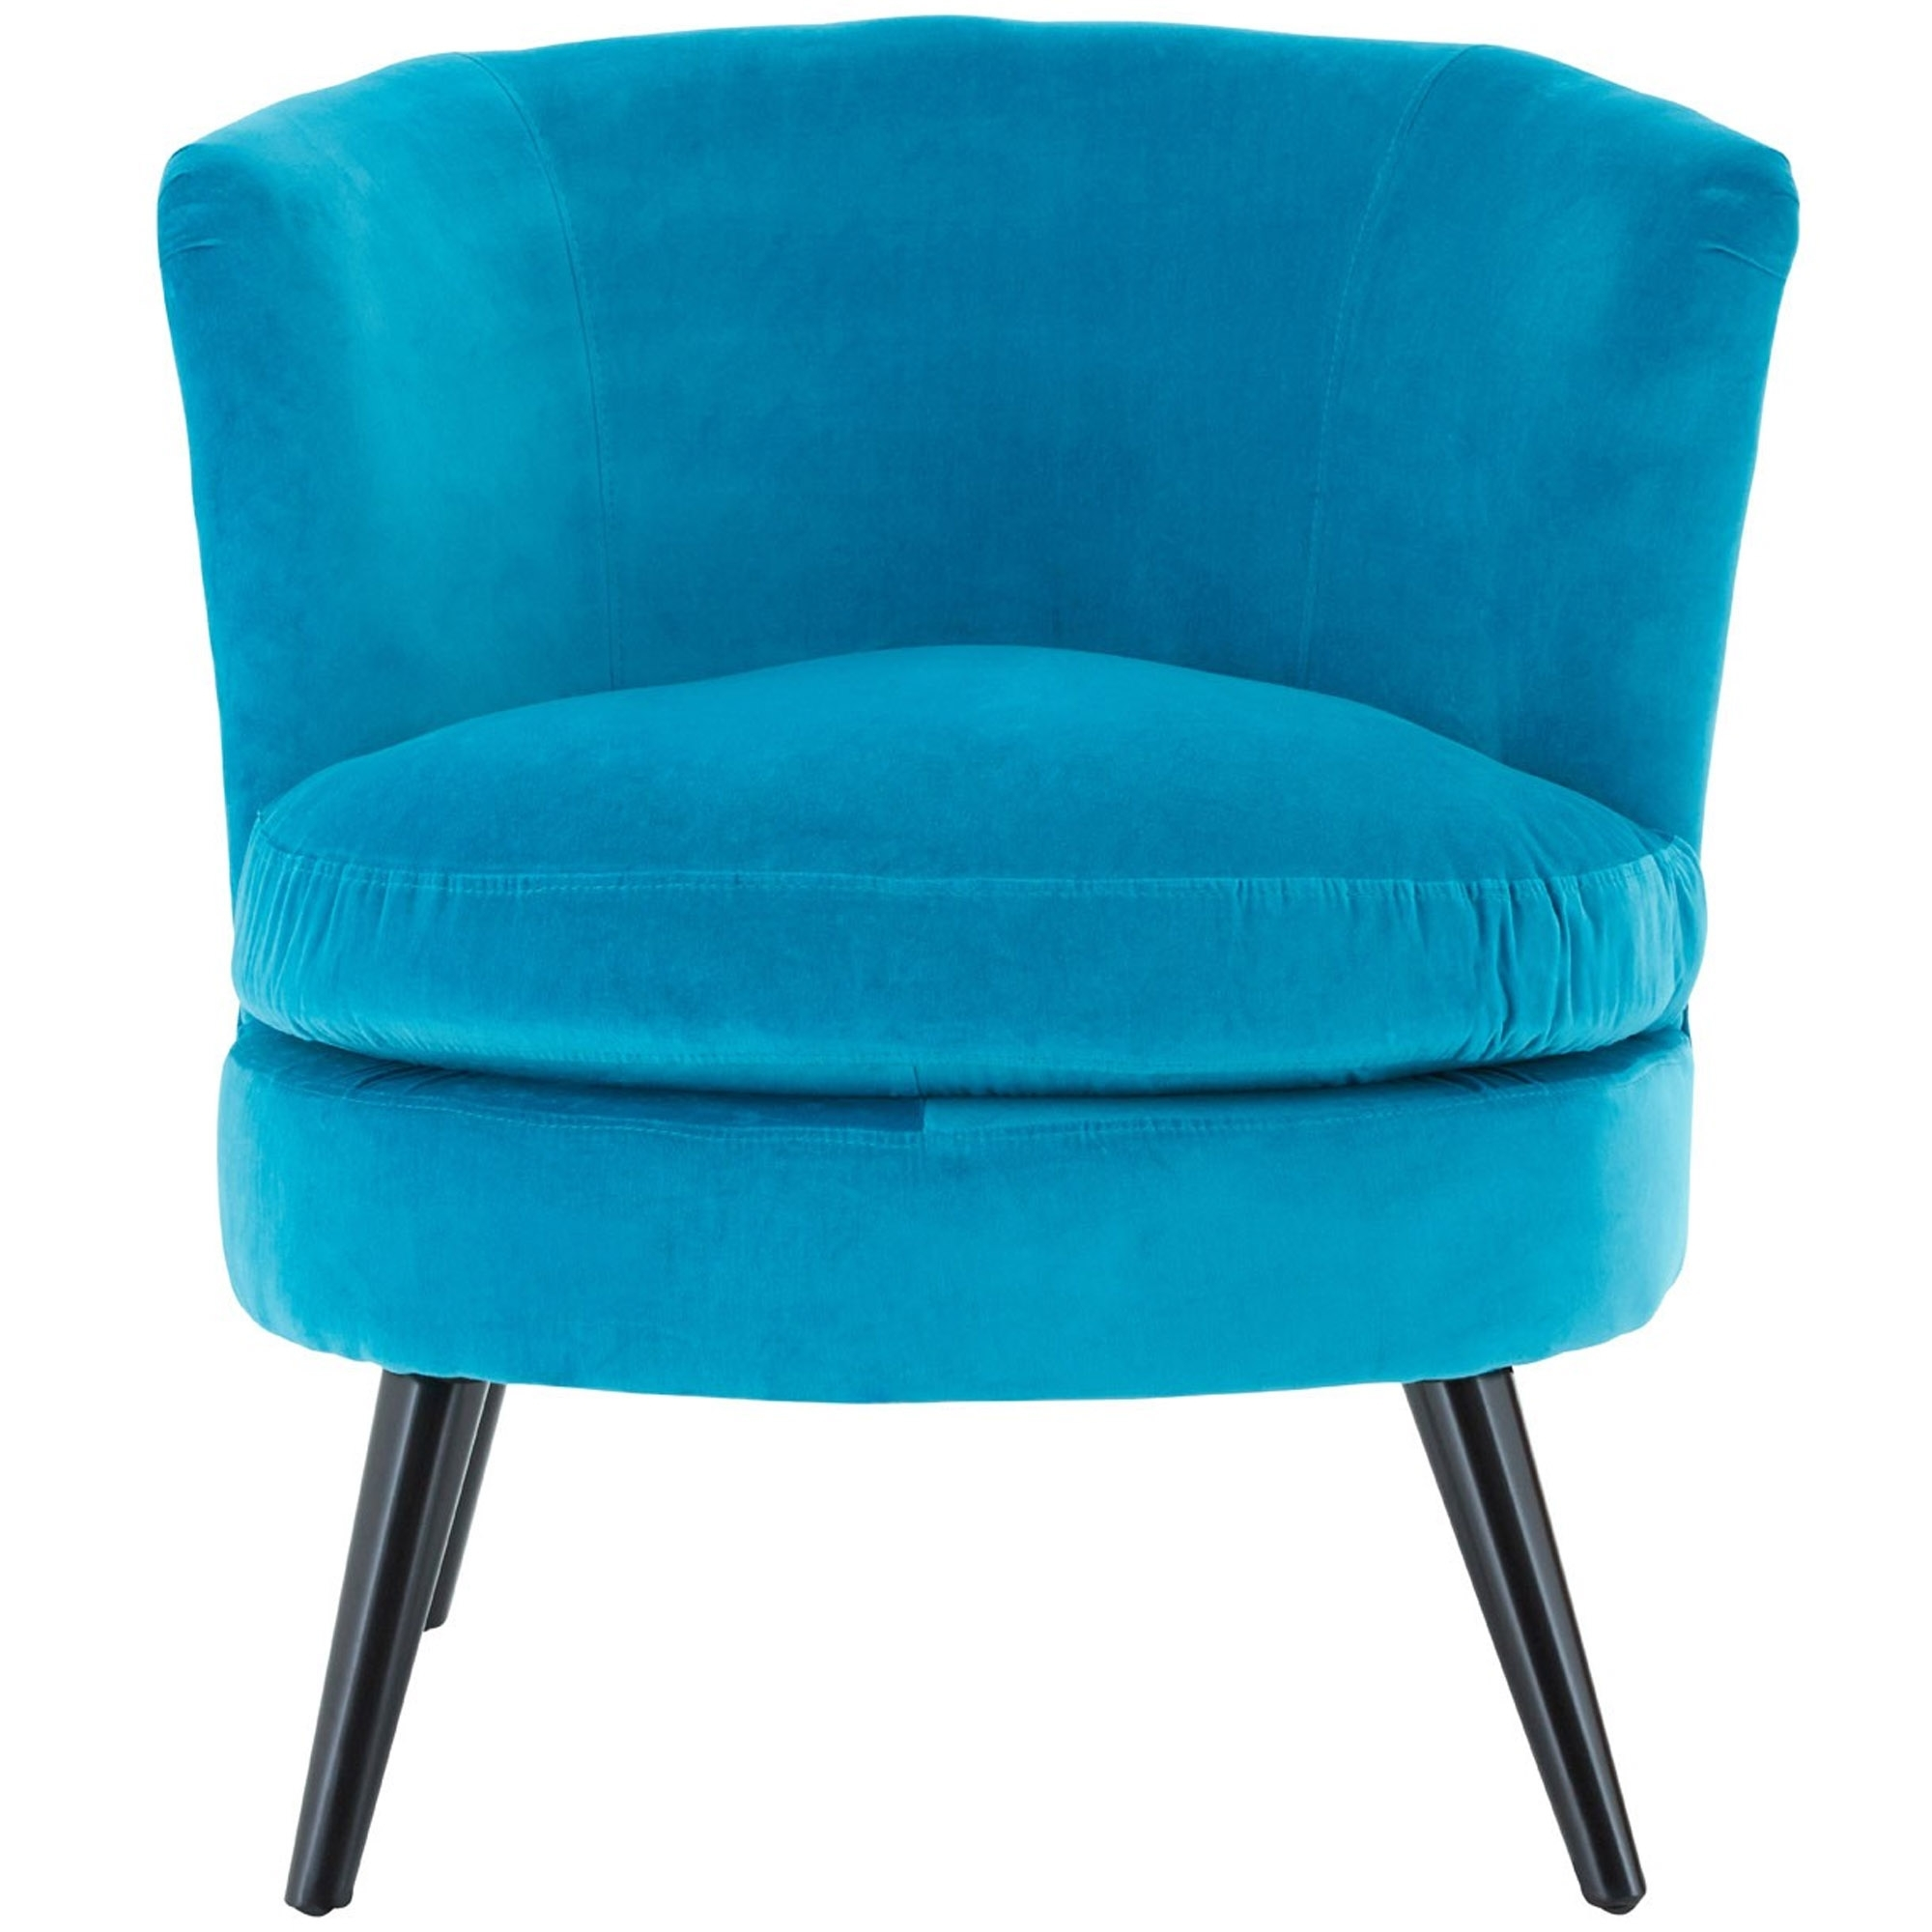 Teal Plush Velvet Round Armchair | Modern & Contemporary ...